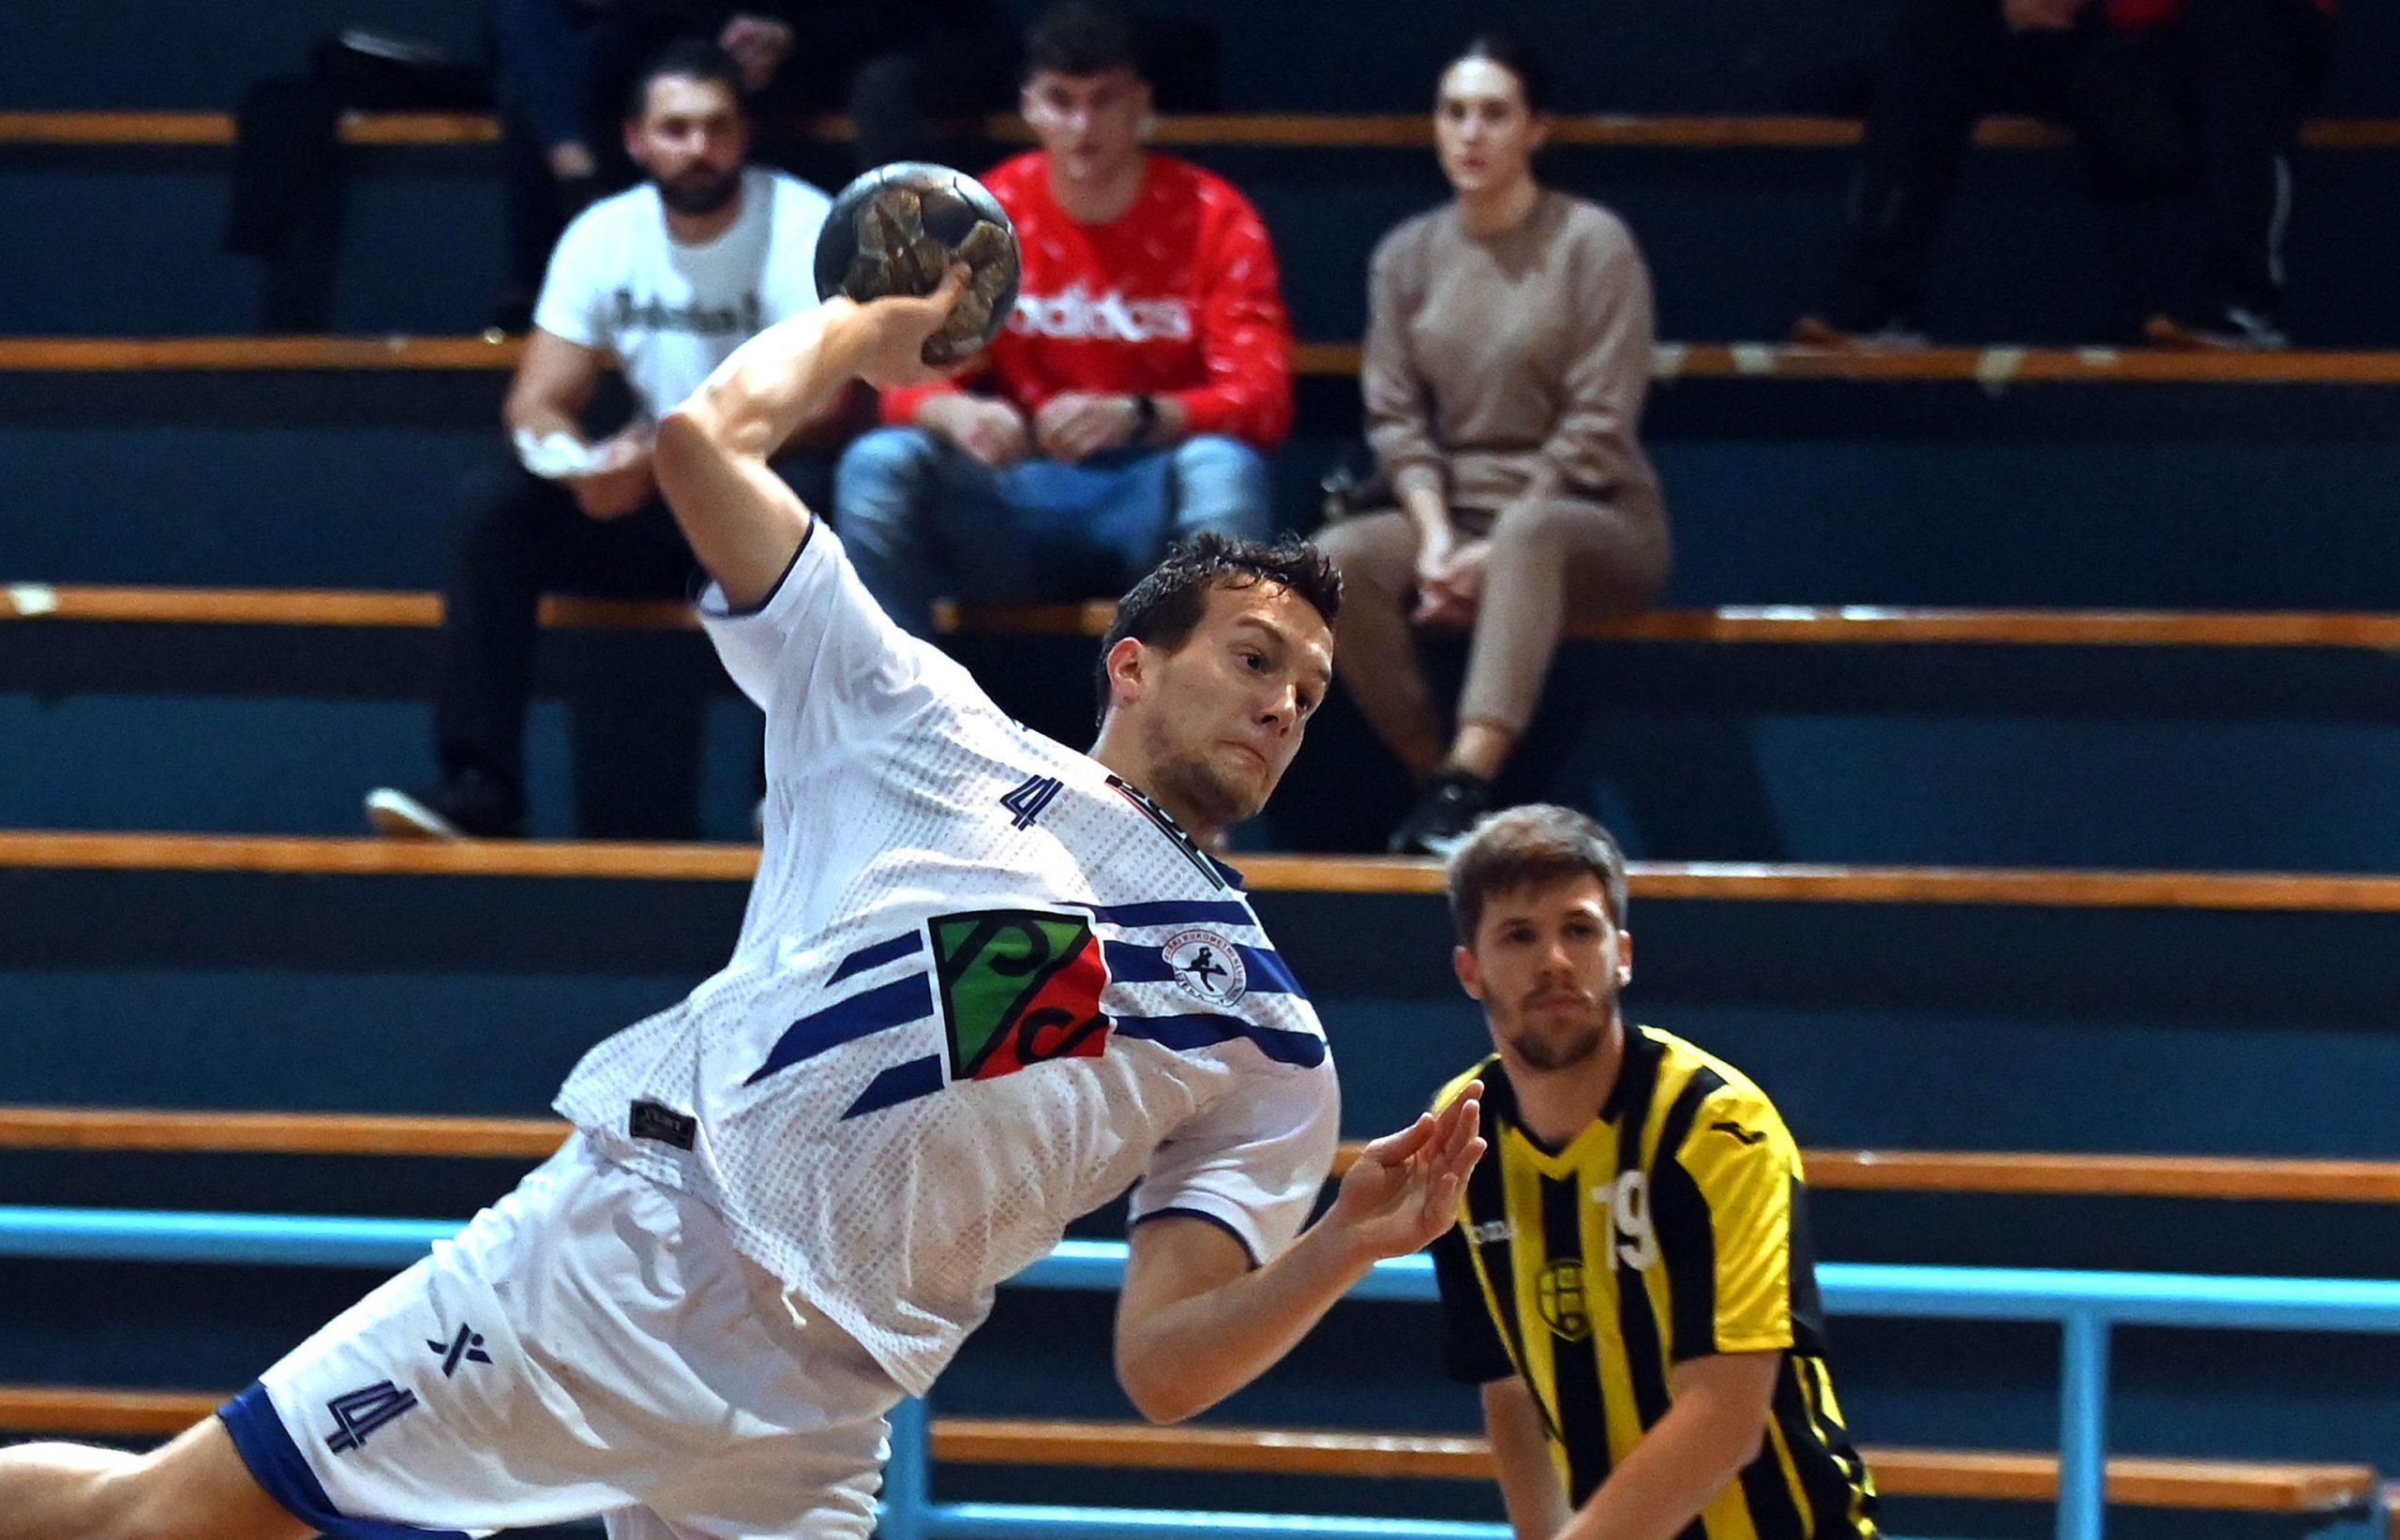 Renato Braut postigao je tri gola za Kozalu/Foto Arhiva NL